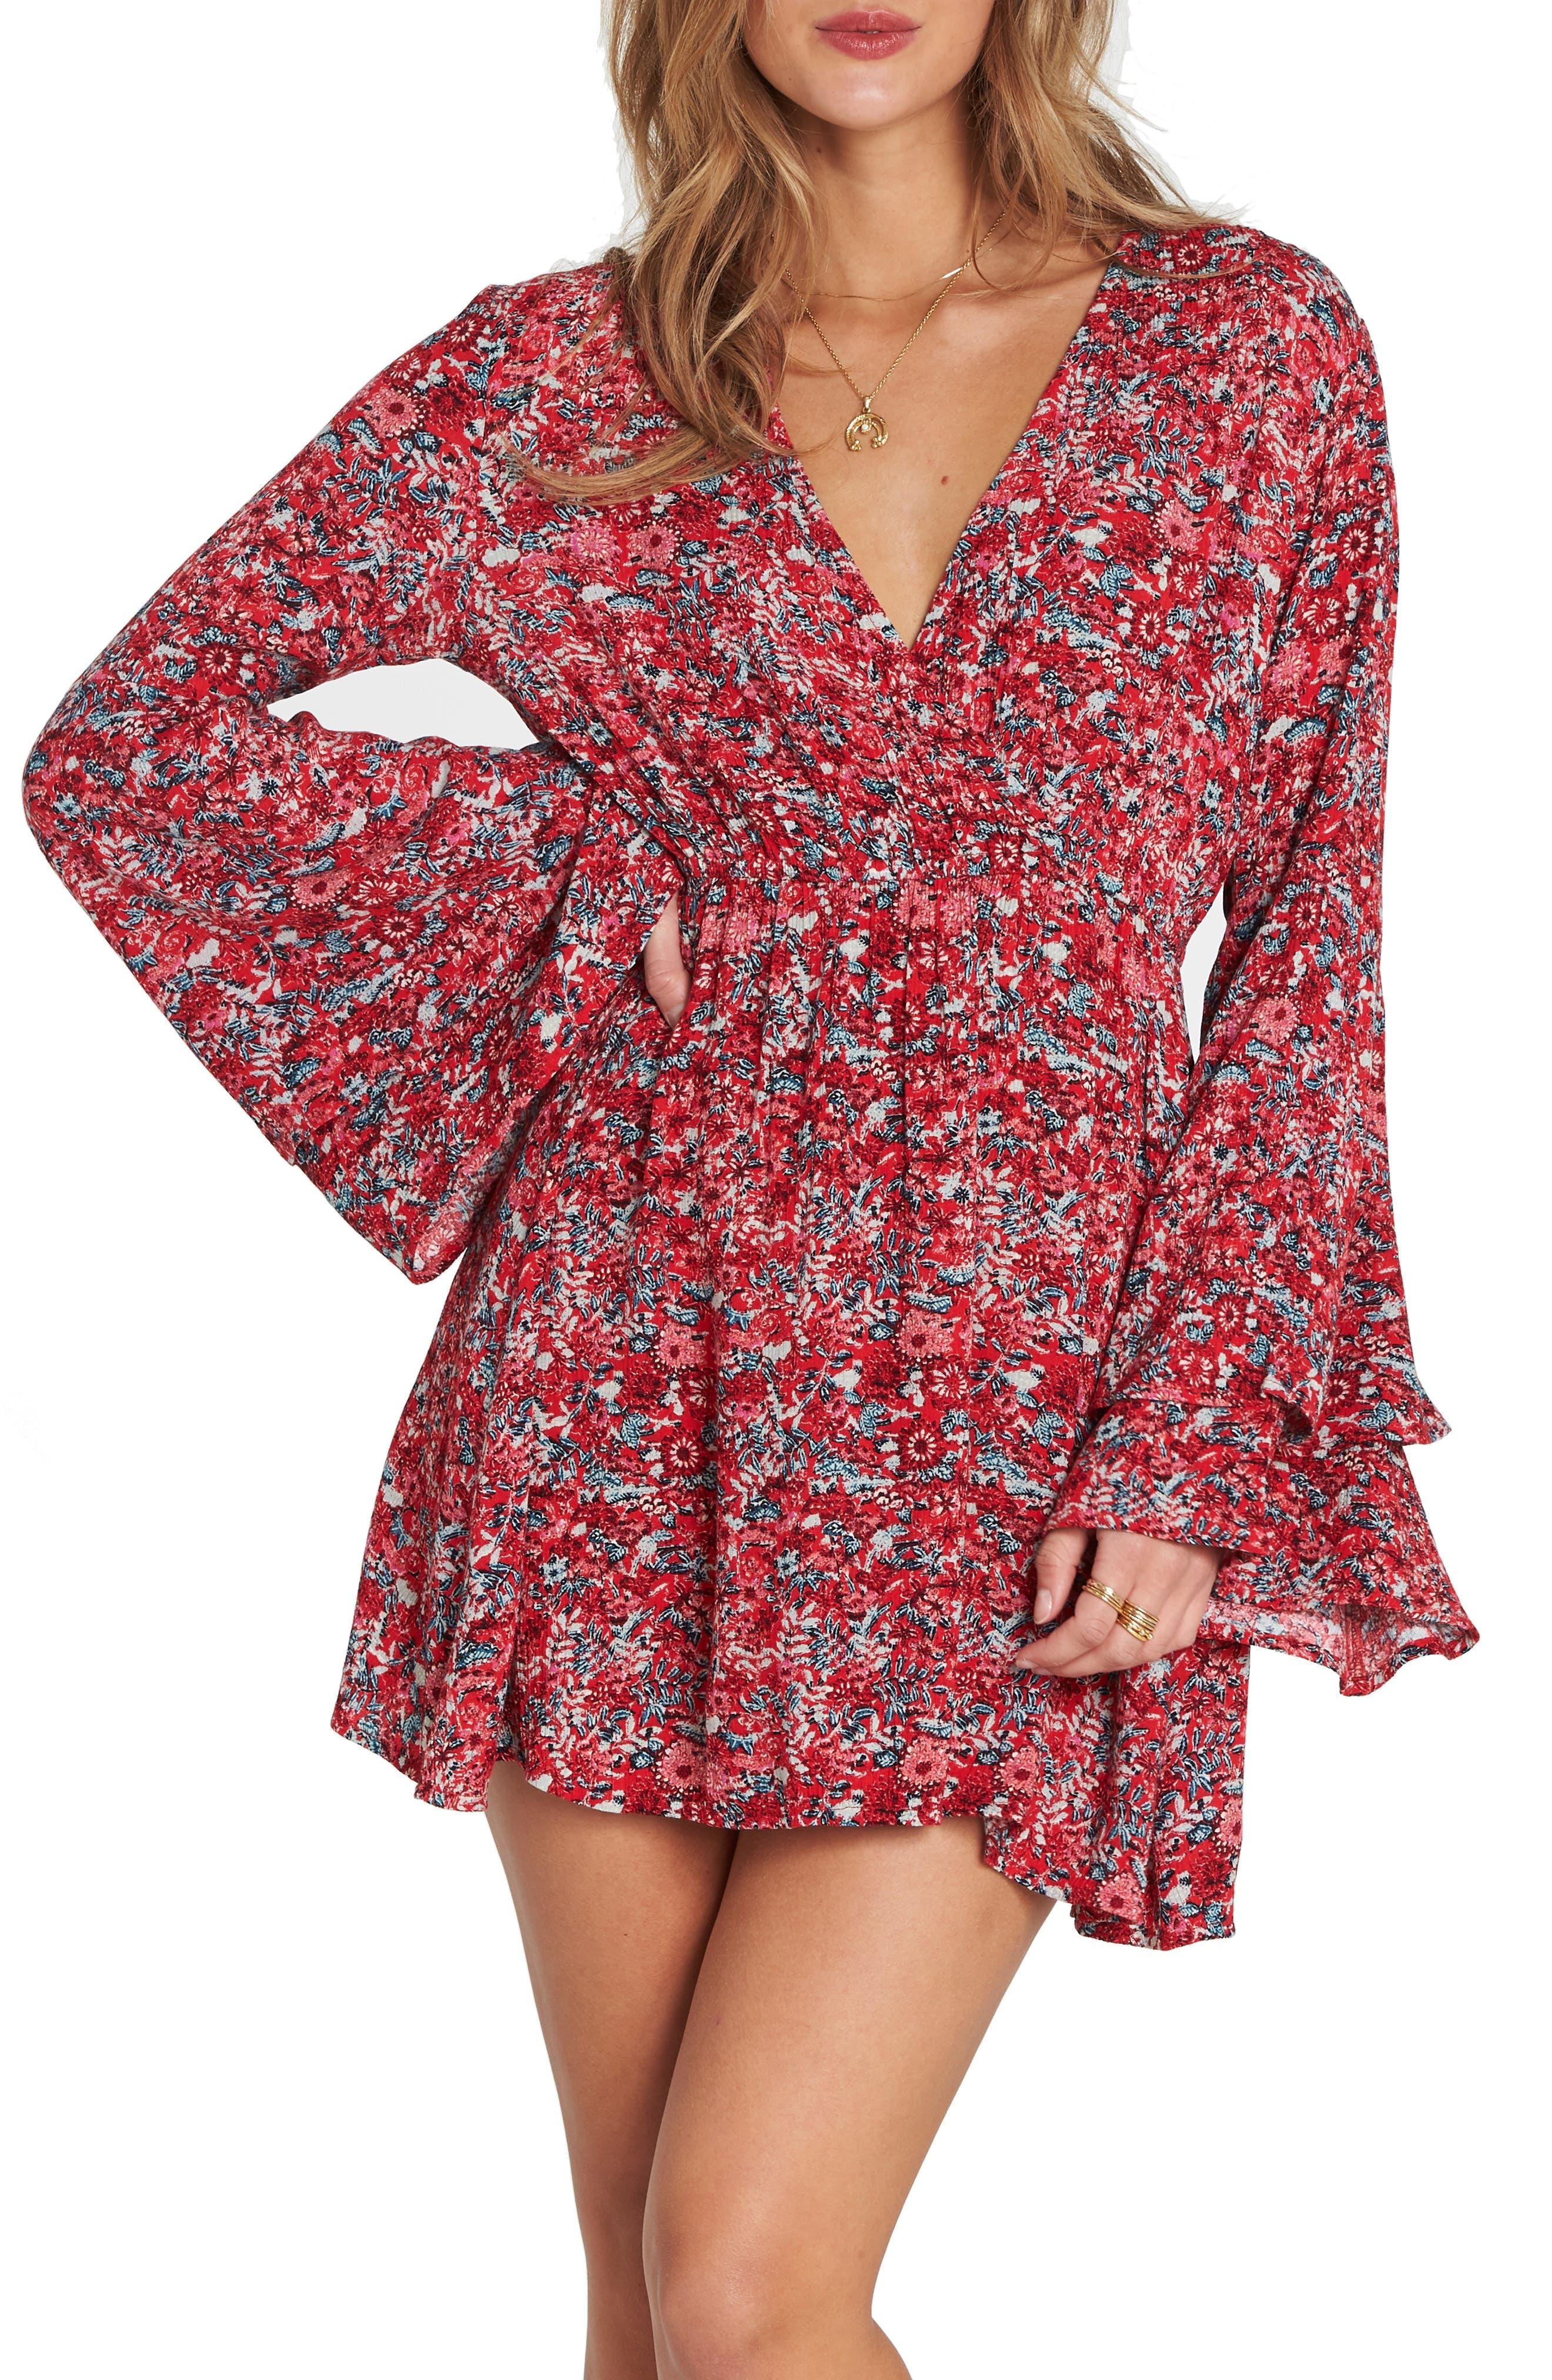 BILLABONG, Night Fever Bell Sleeve Dress, Main thumbnail 1, color, 601